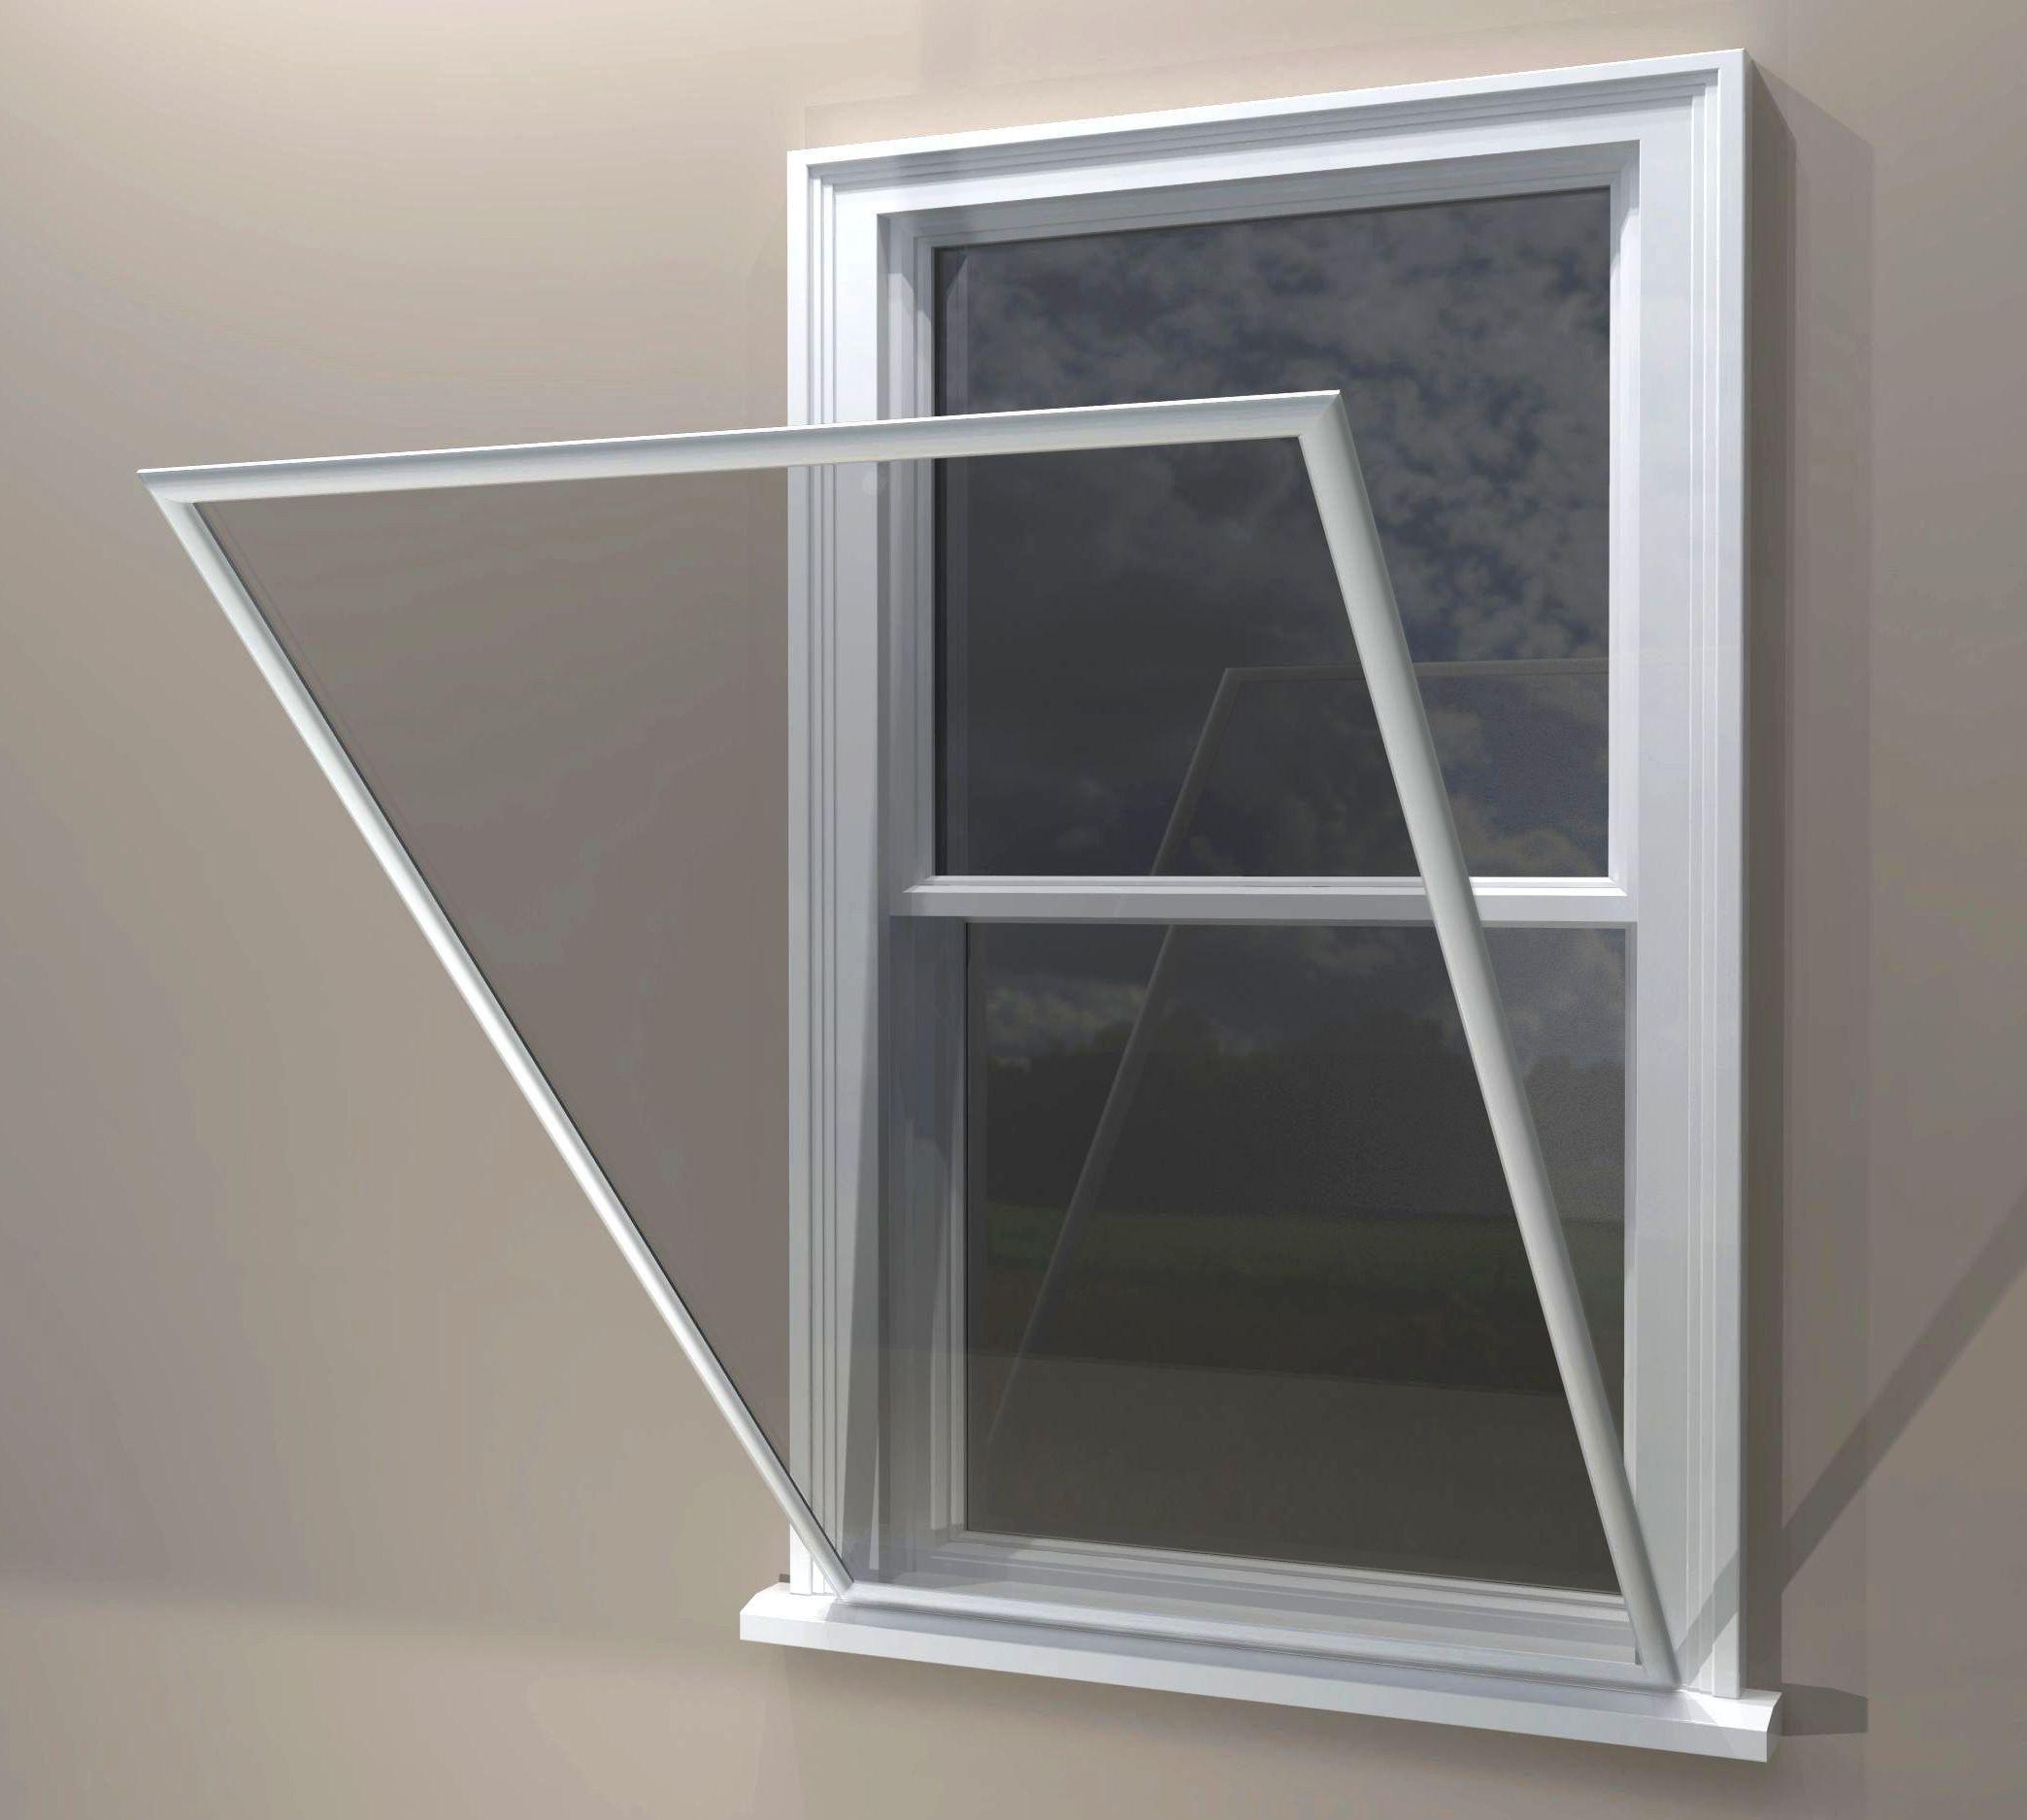 Indow Window Inserts Interior Storm Windows Window Inserts